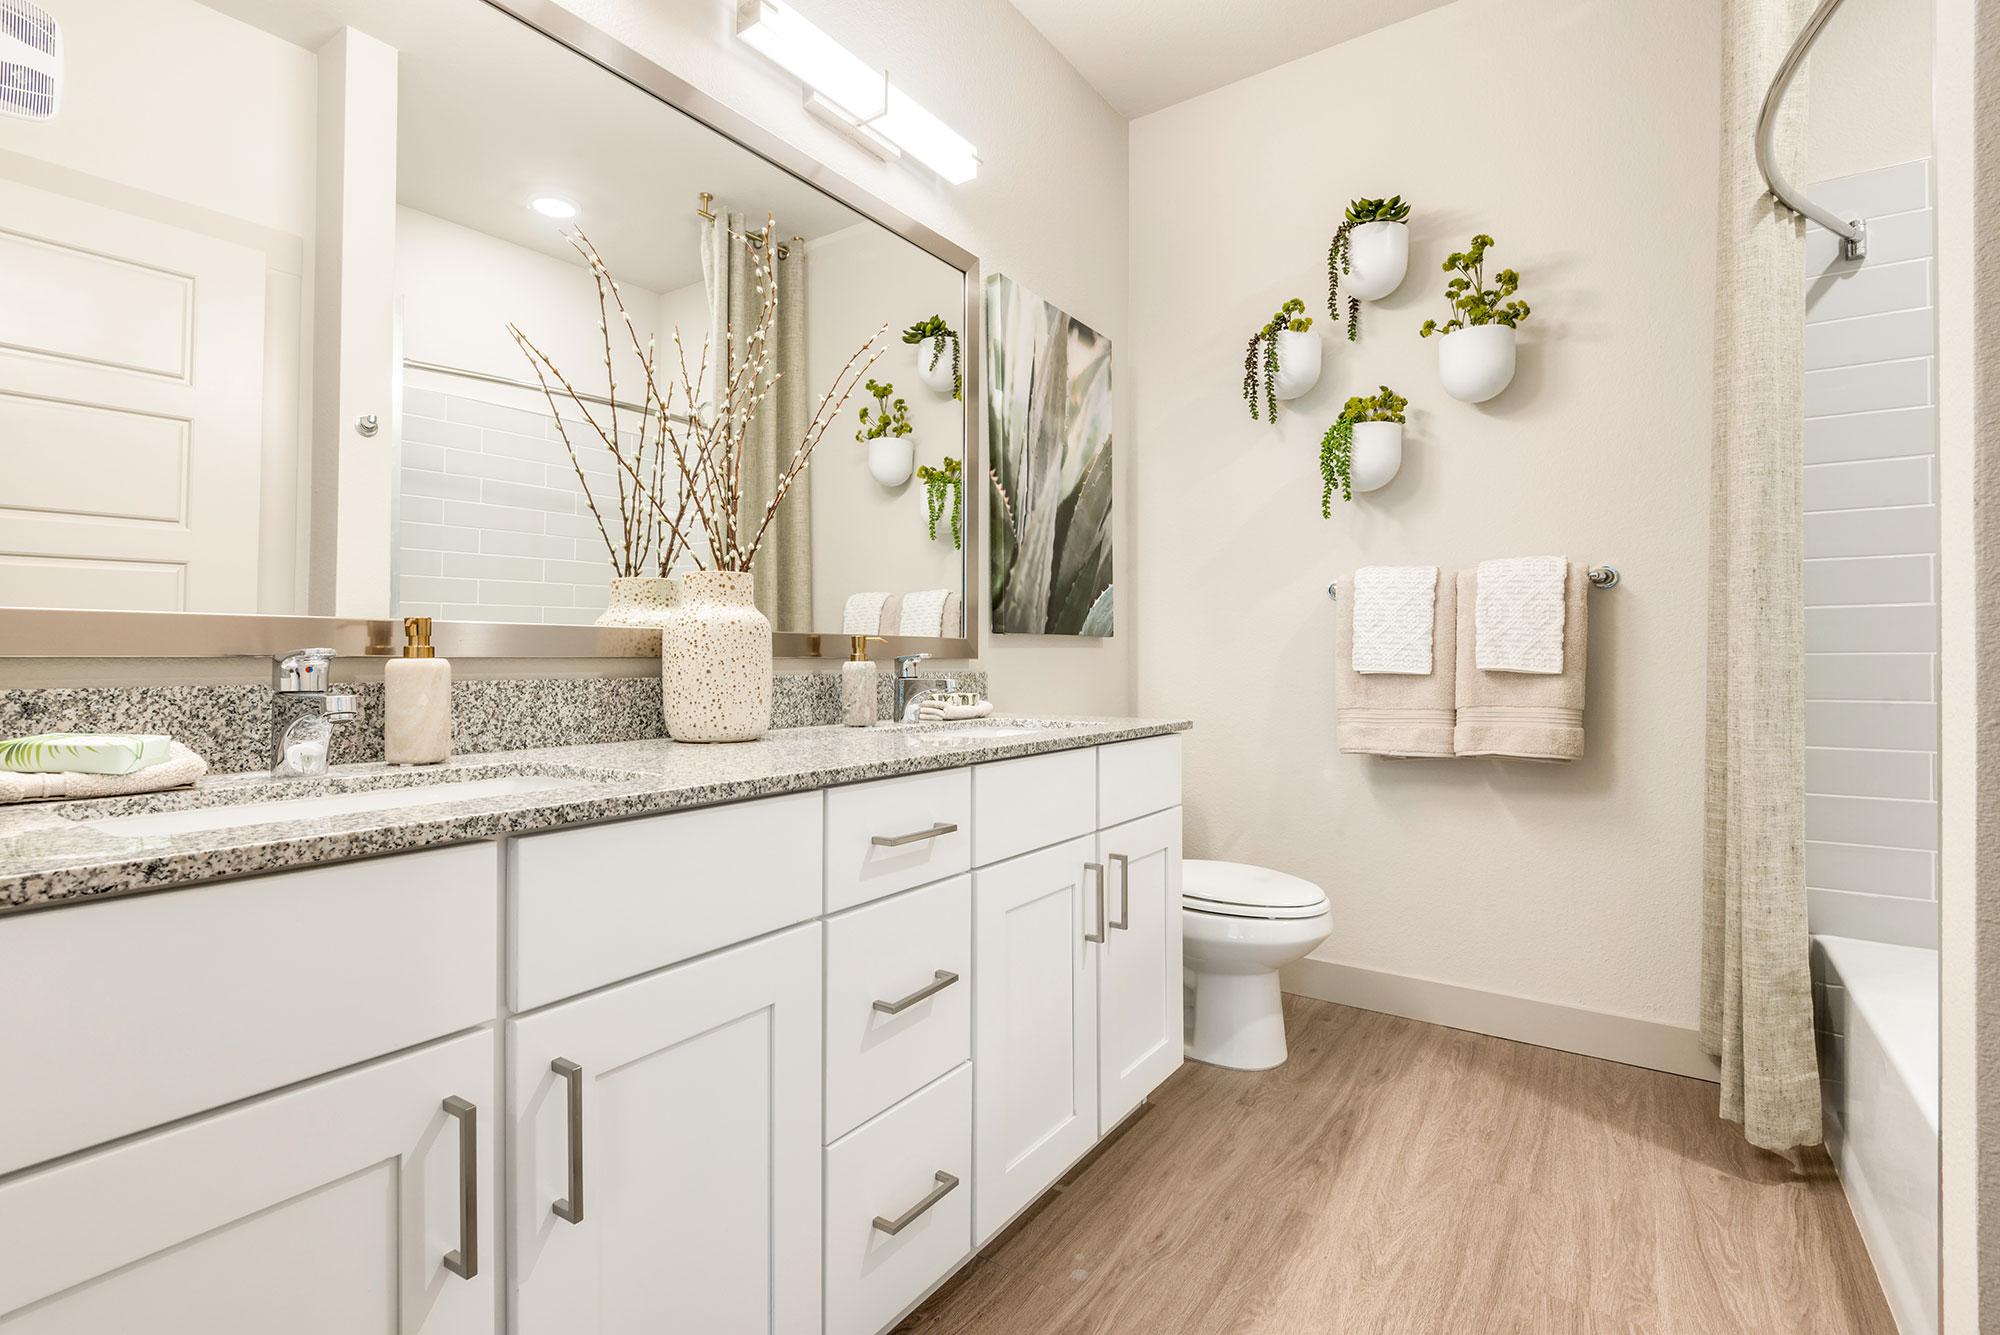 Riata - Model Unit - Large Bathroom vanity